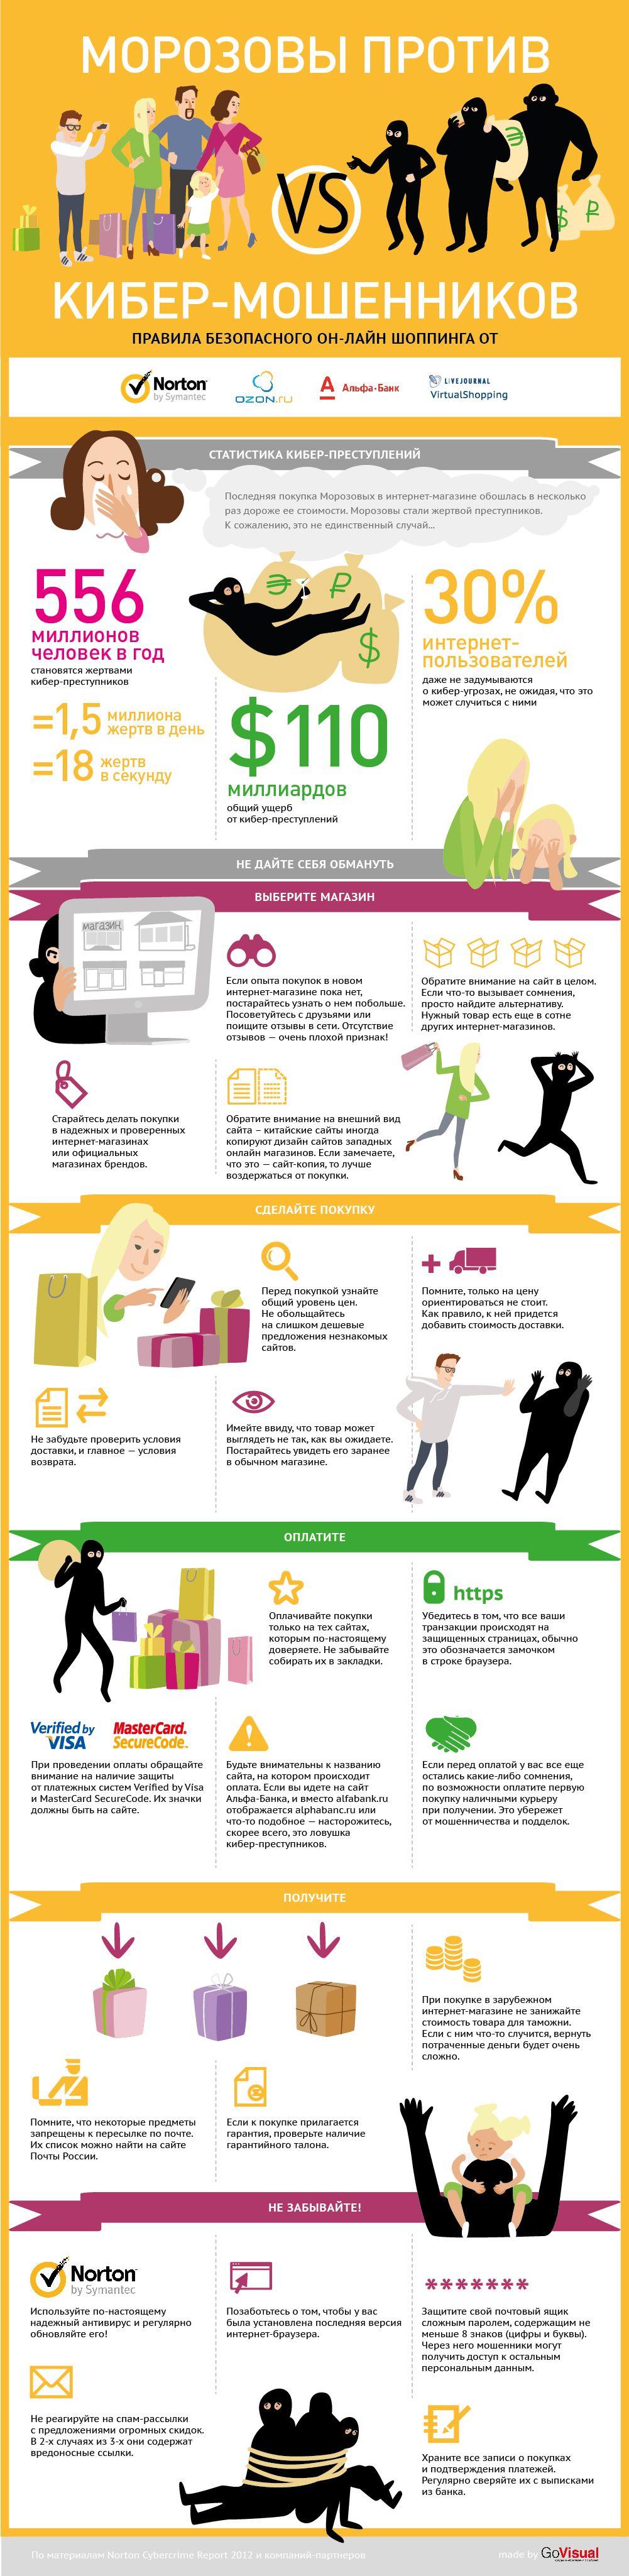 Правила безопасного он-лайн шопинга